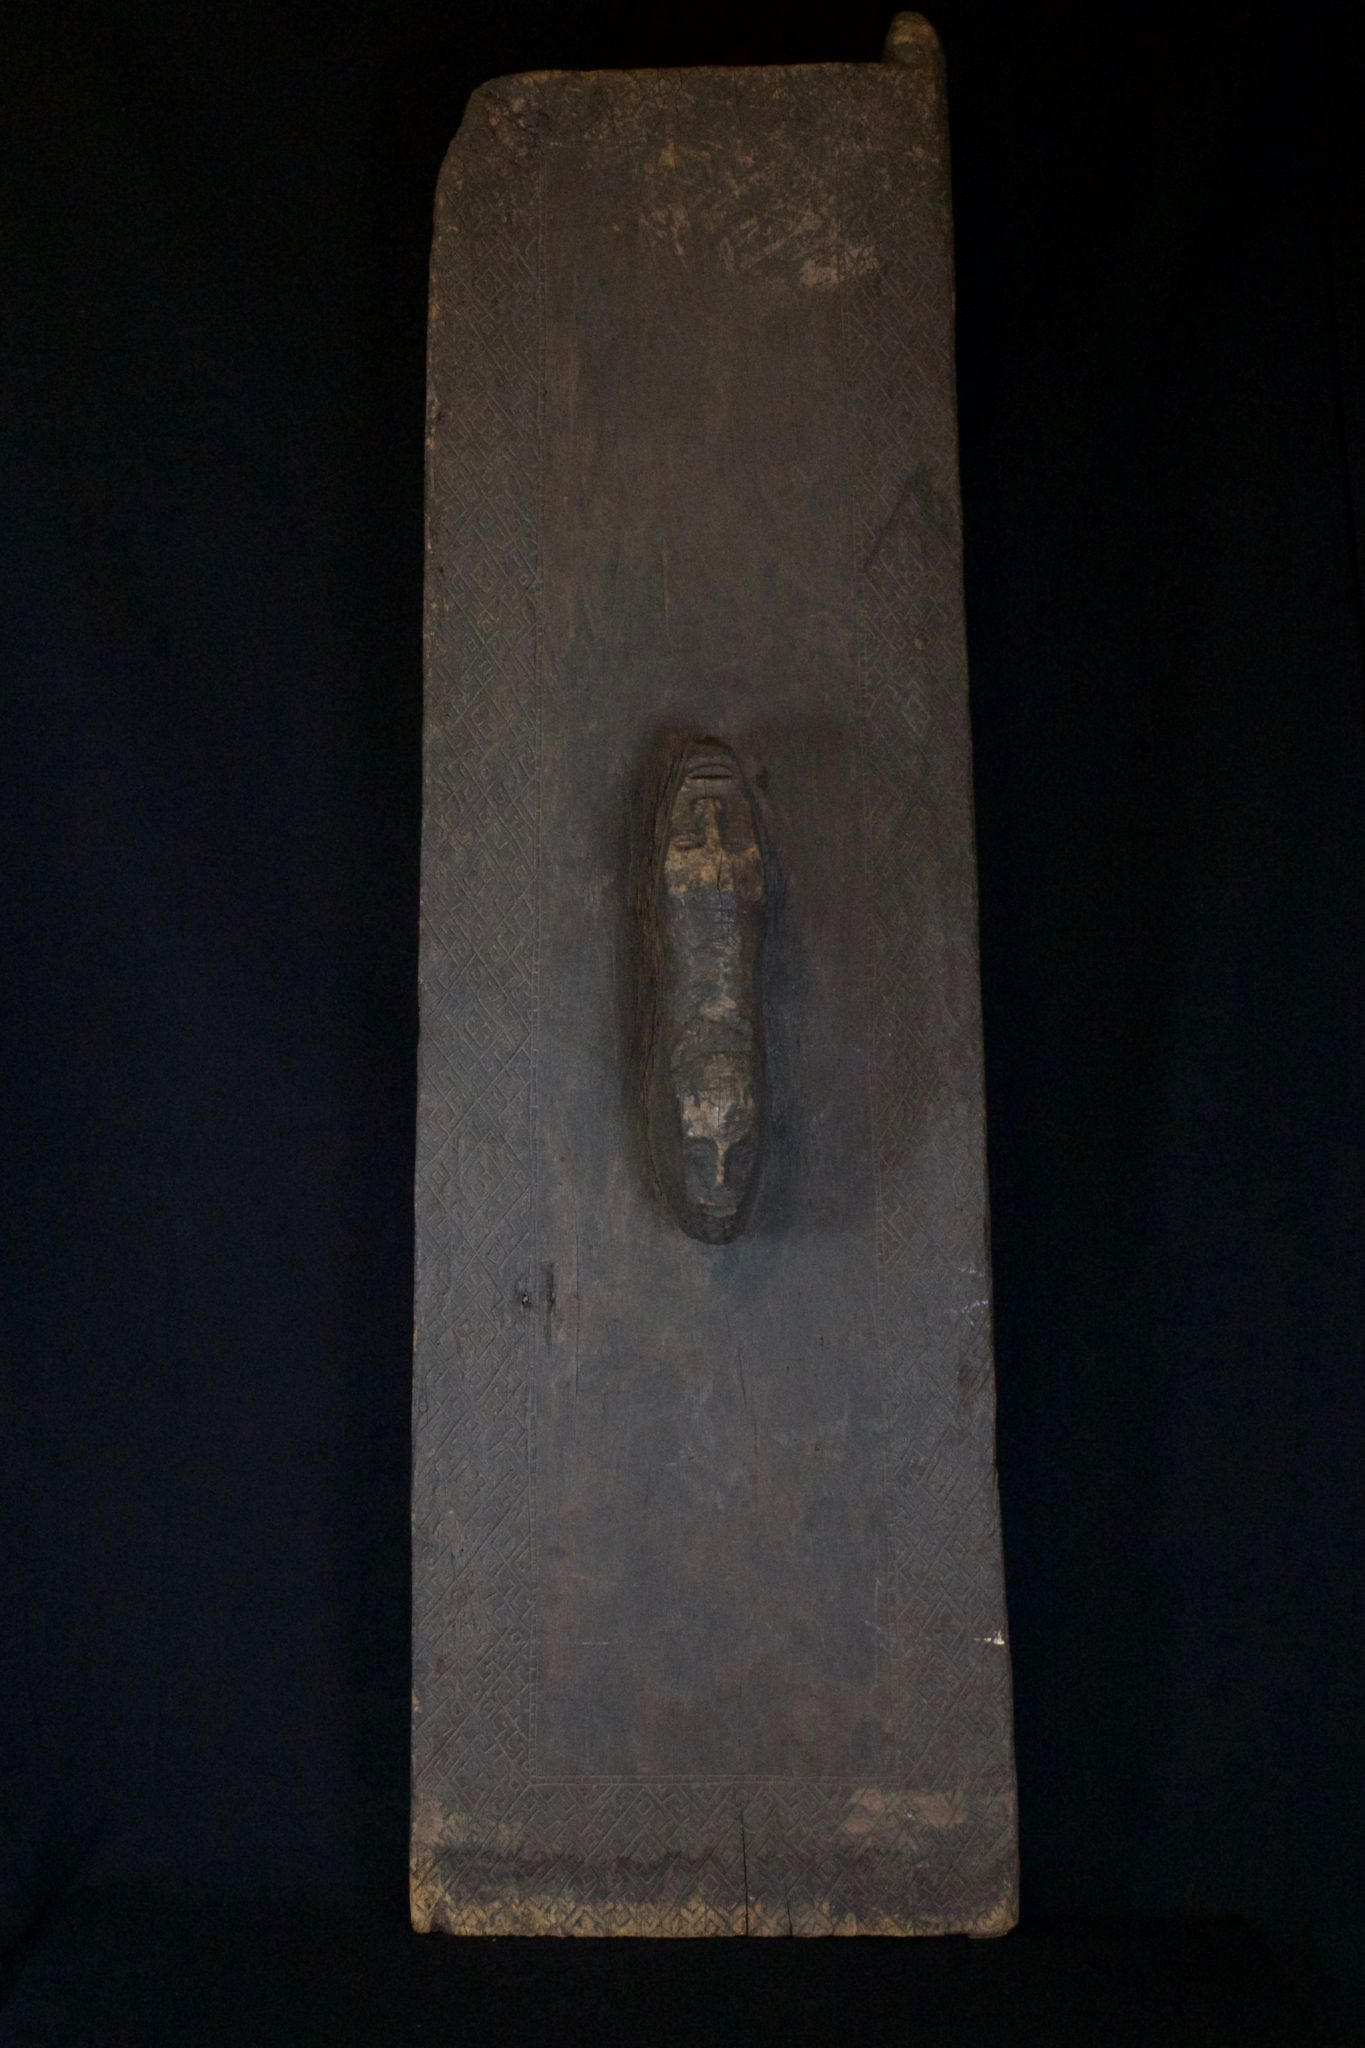 "Shaman Ritual Spirit Door, Sumatra, Indonesia, Batak tribe, Late 19th c, Wood, patinated with age and use. 52 ¼"" x 16"" x 6 ½"", $2200."